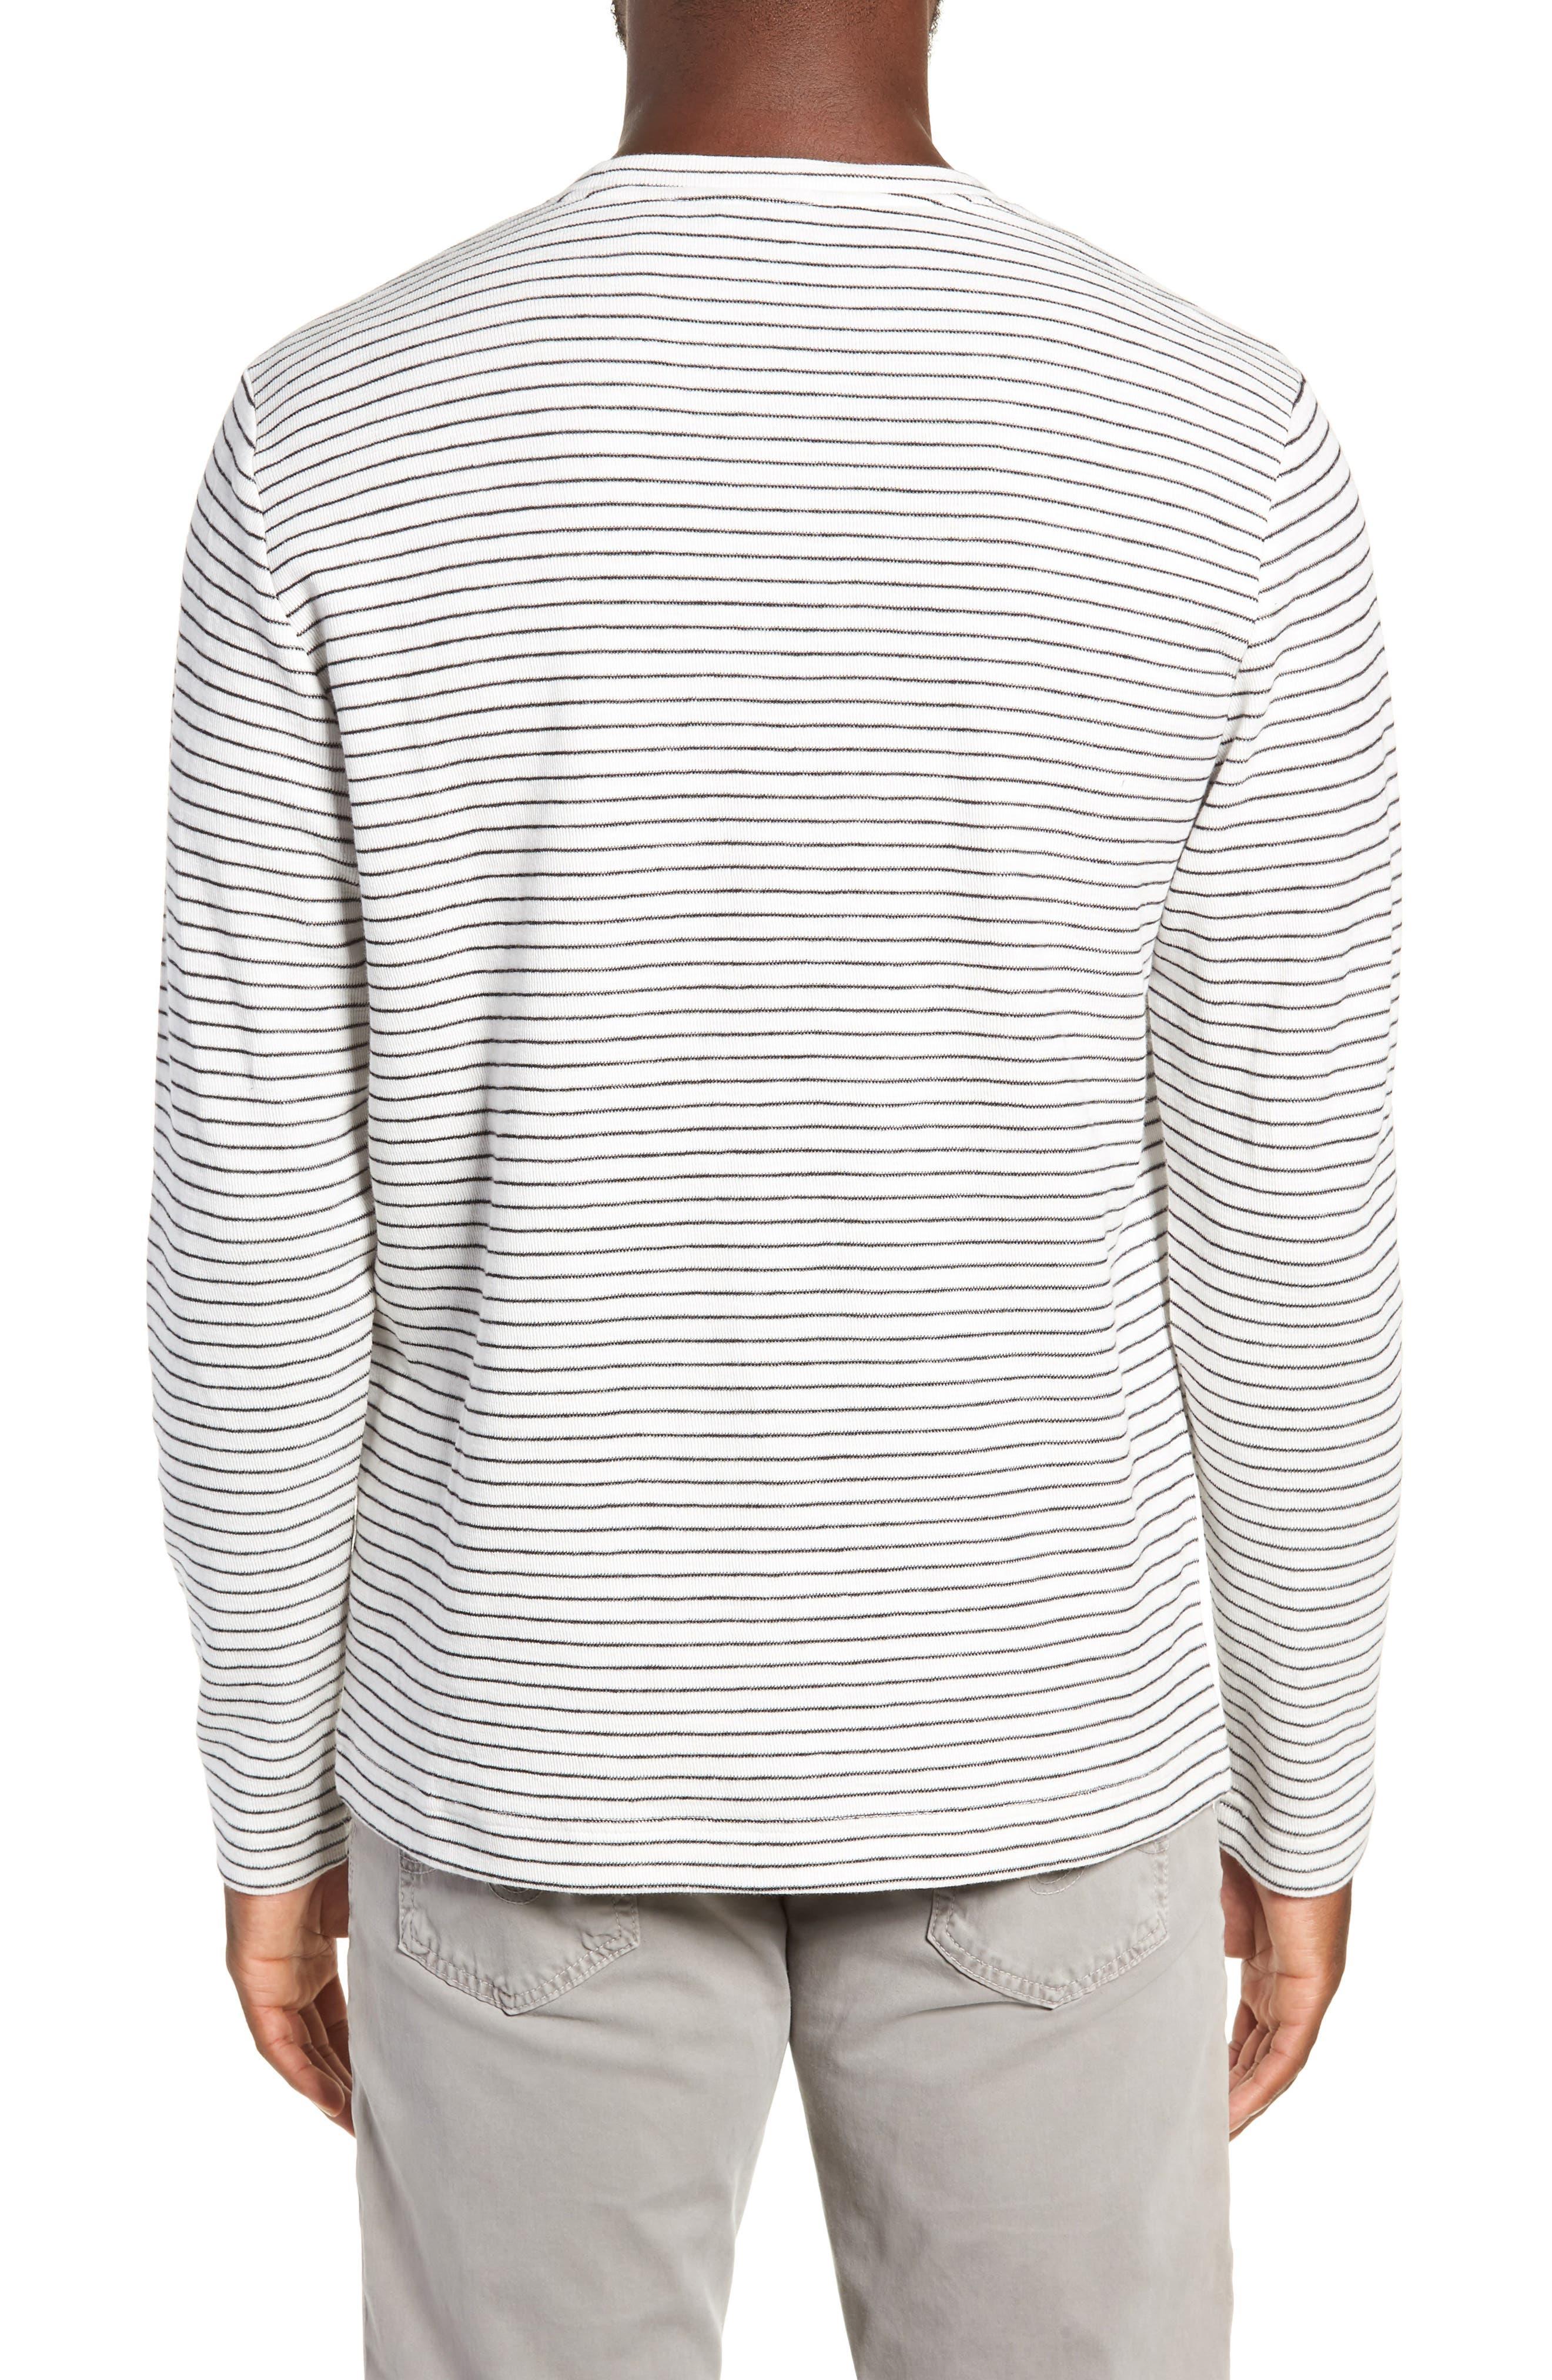 Stripe Long Sleeve Pocket T-Shirt,                             Alternate thumbnail 2, color,                             NATURAL